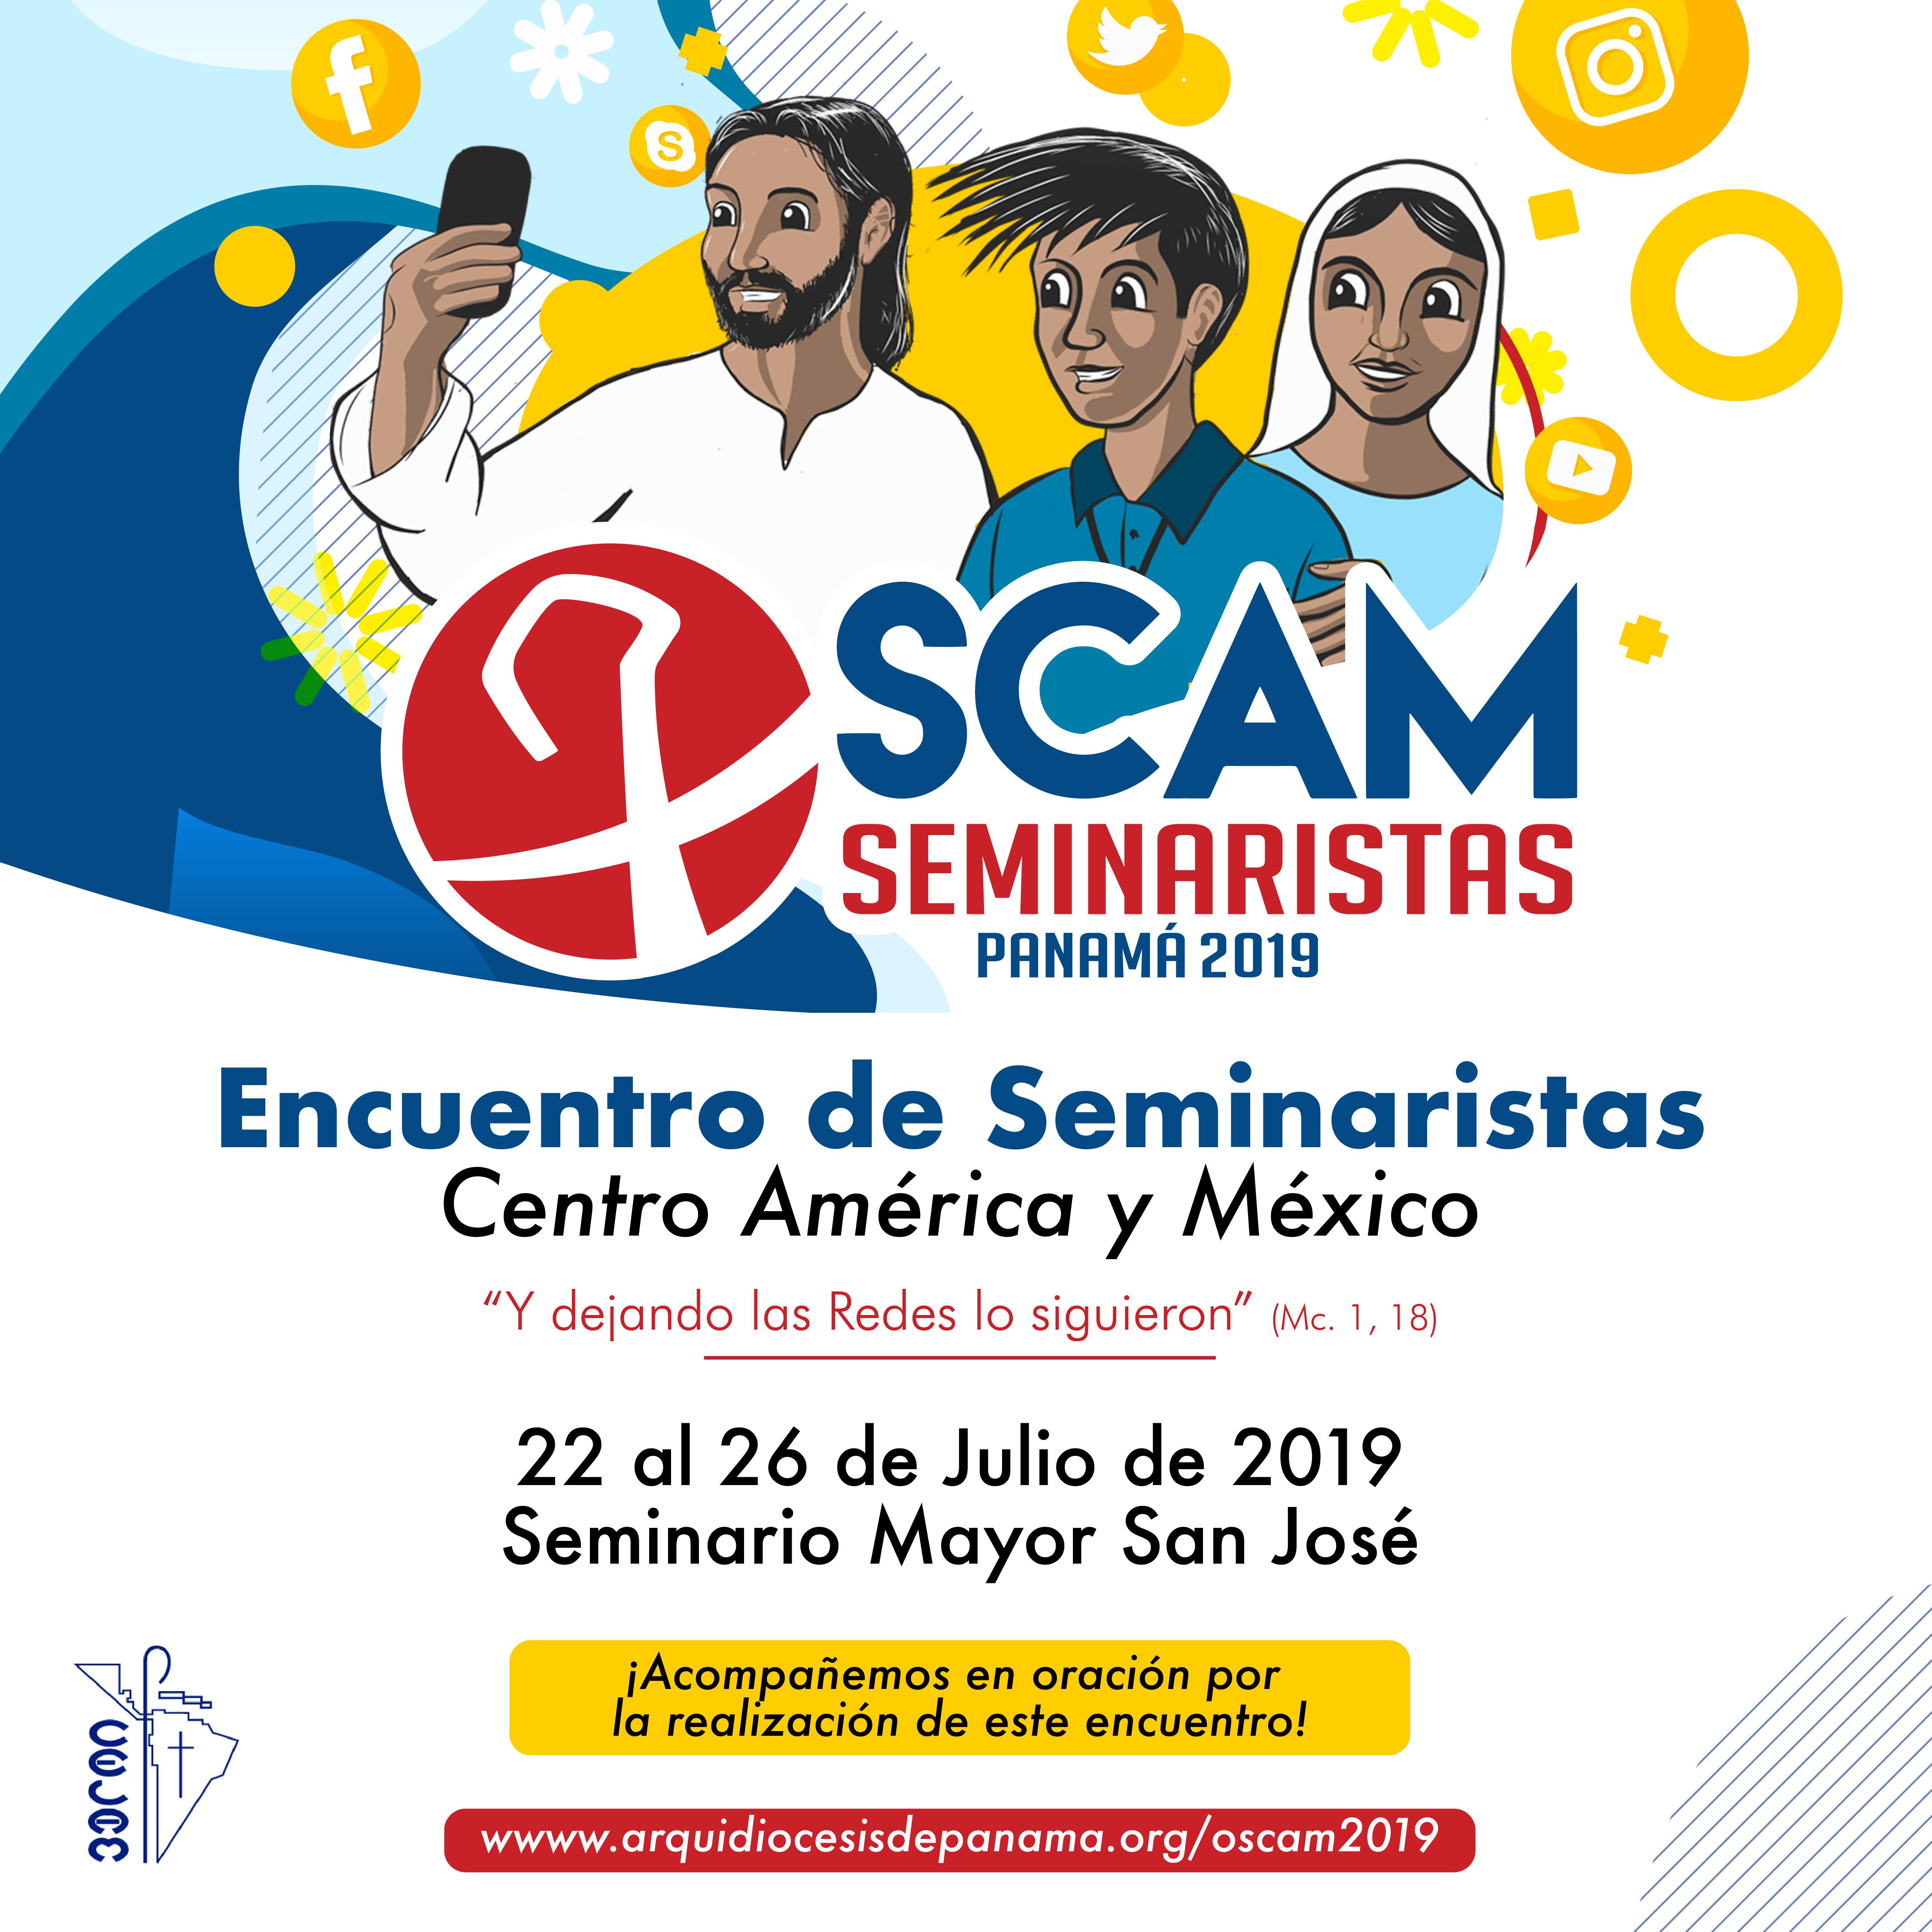 Futuros sacerdotes centroamericanos y de México inician encuentro en Panamá